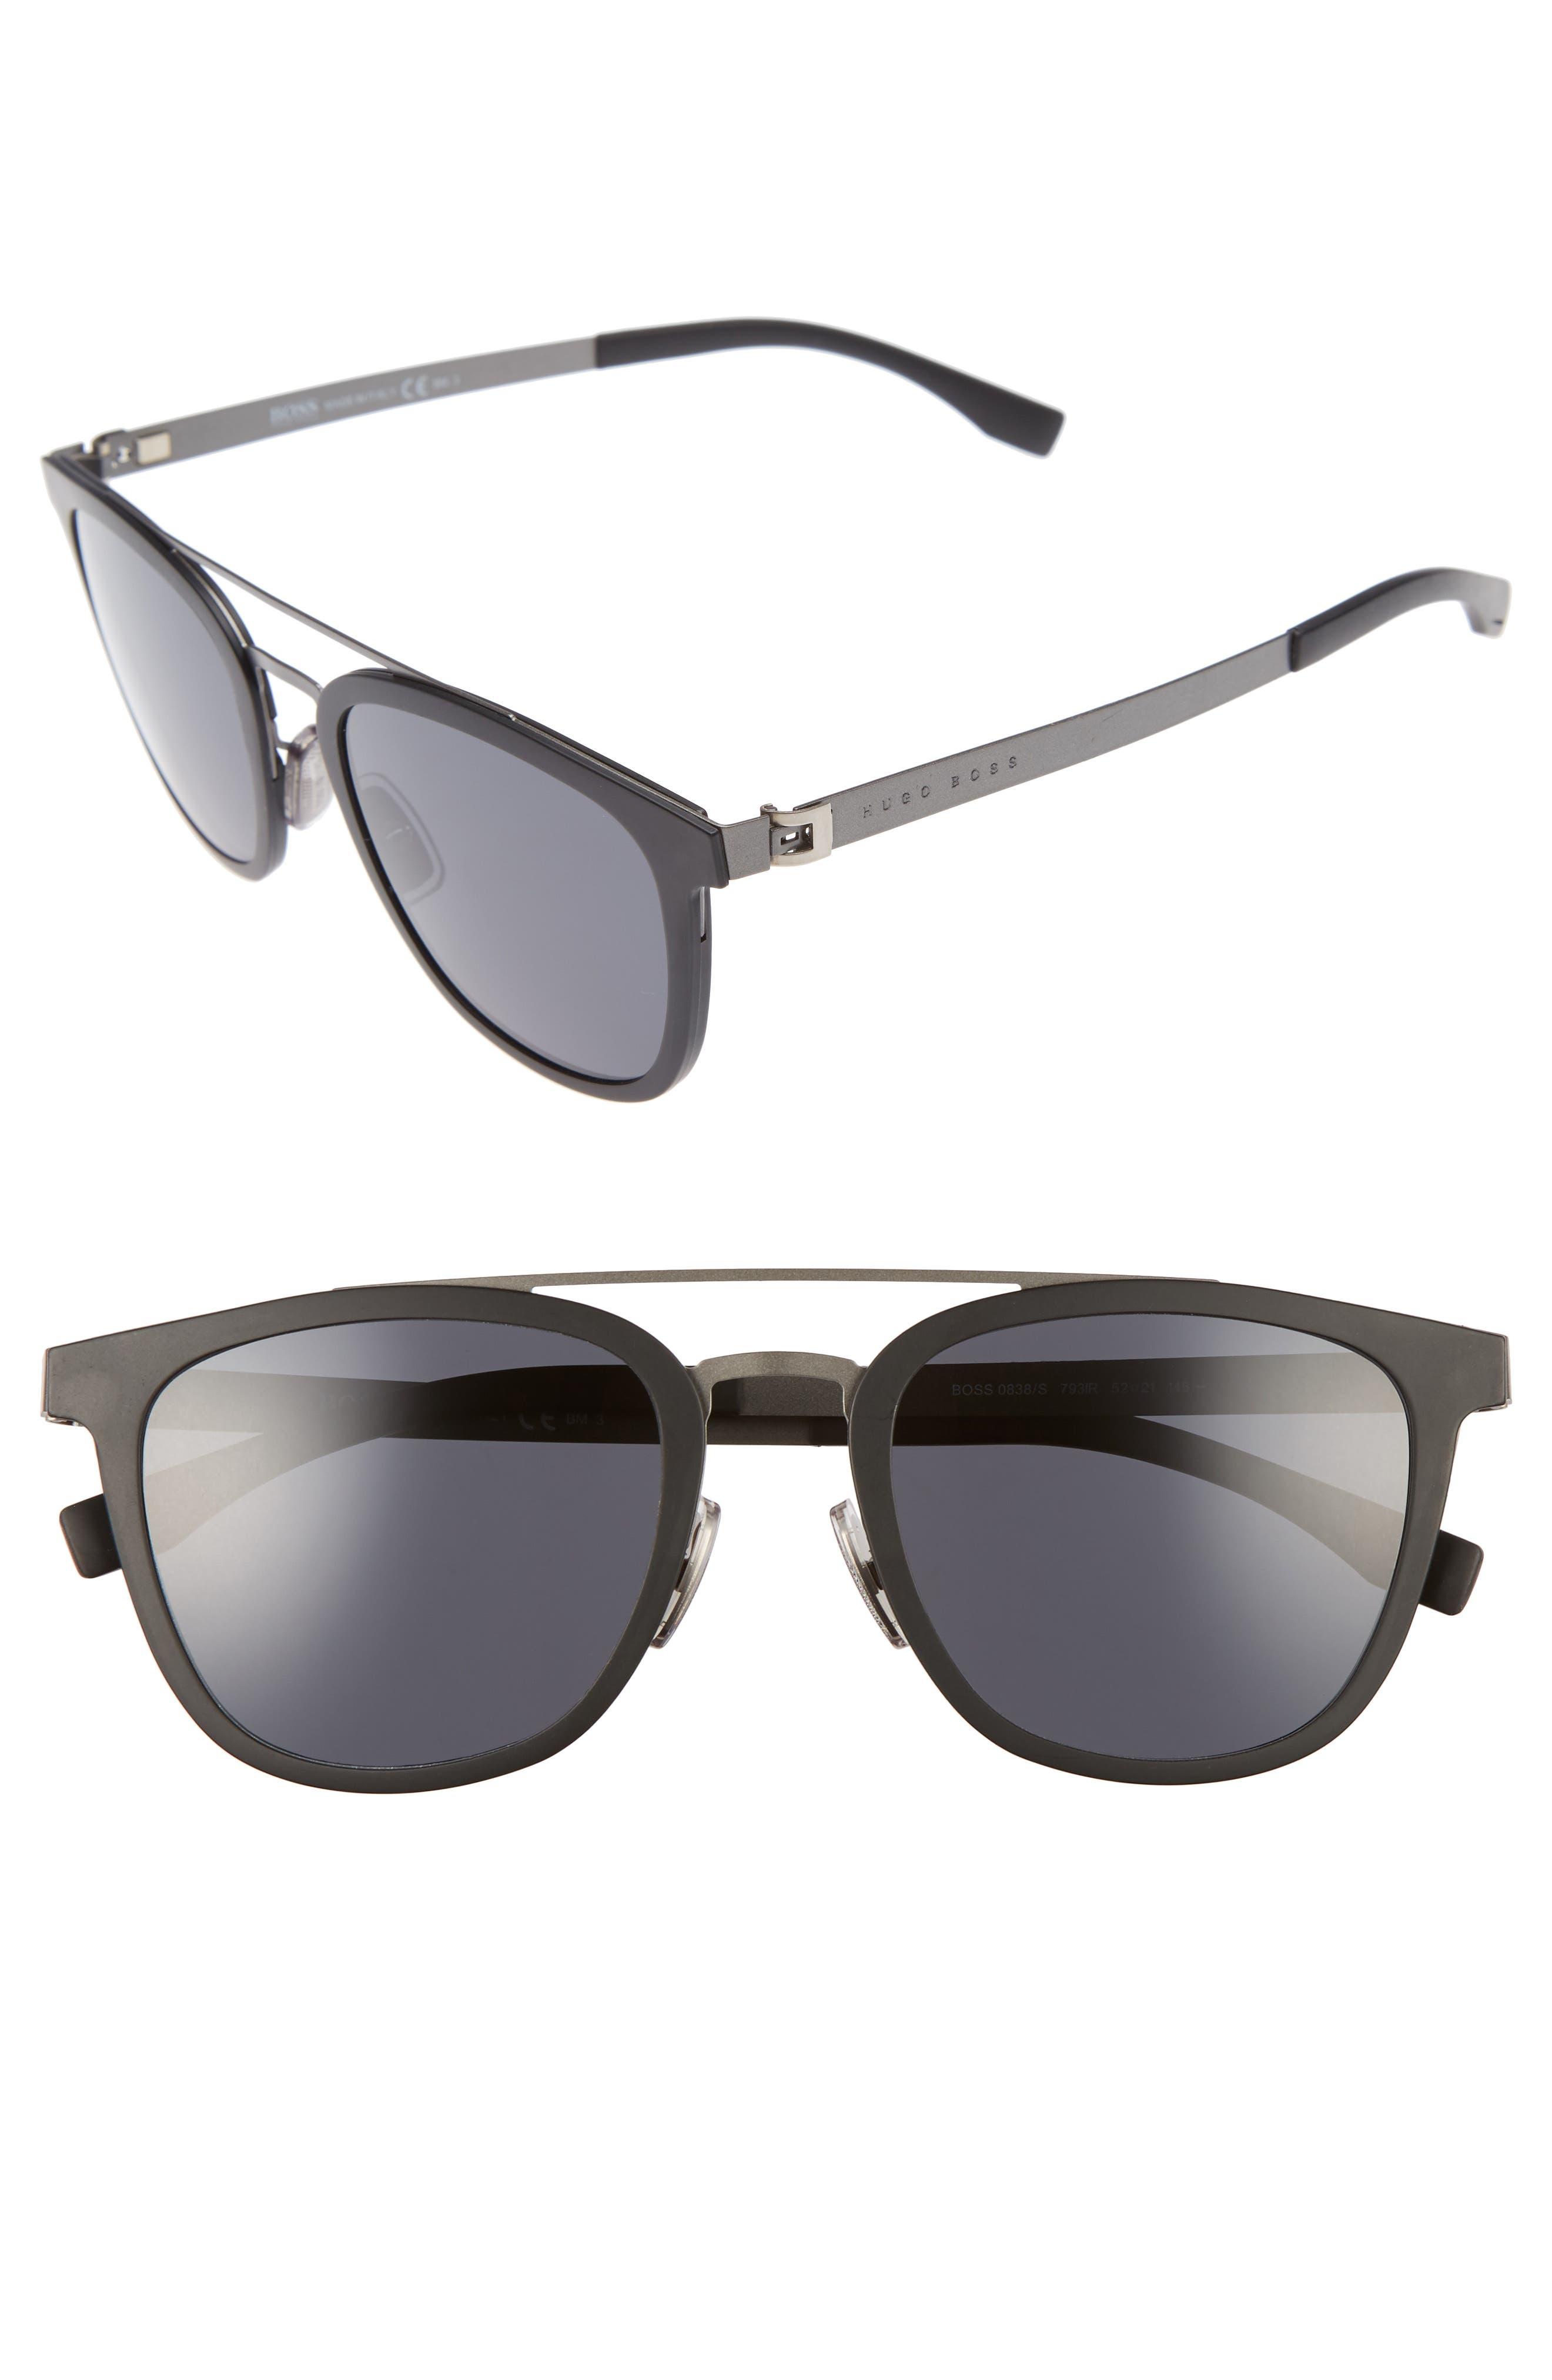 838/S 52mm Sunglasses,                             Alternate thumbnail 2, color,                             002